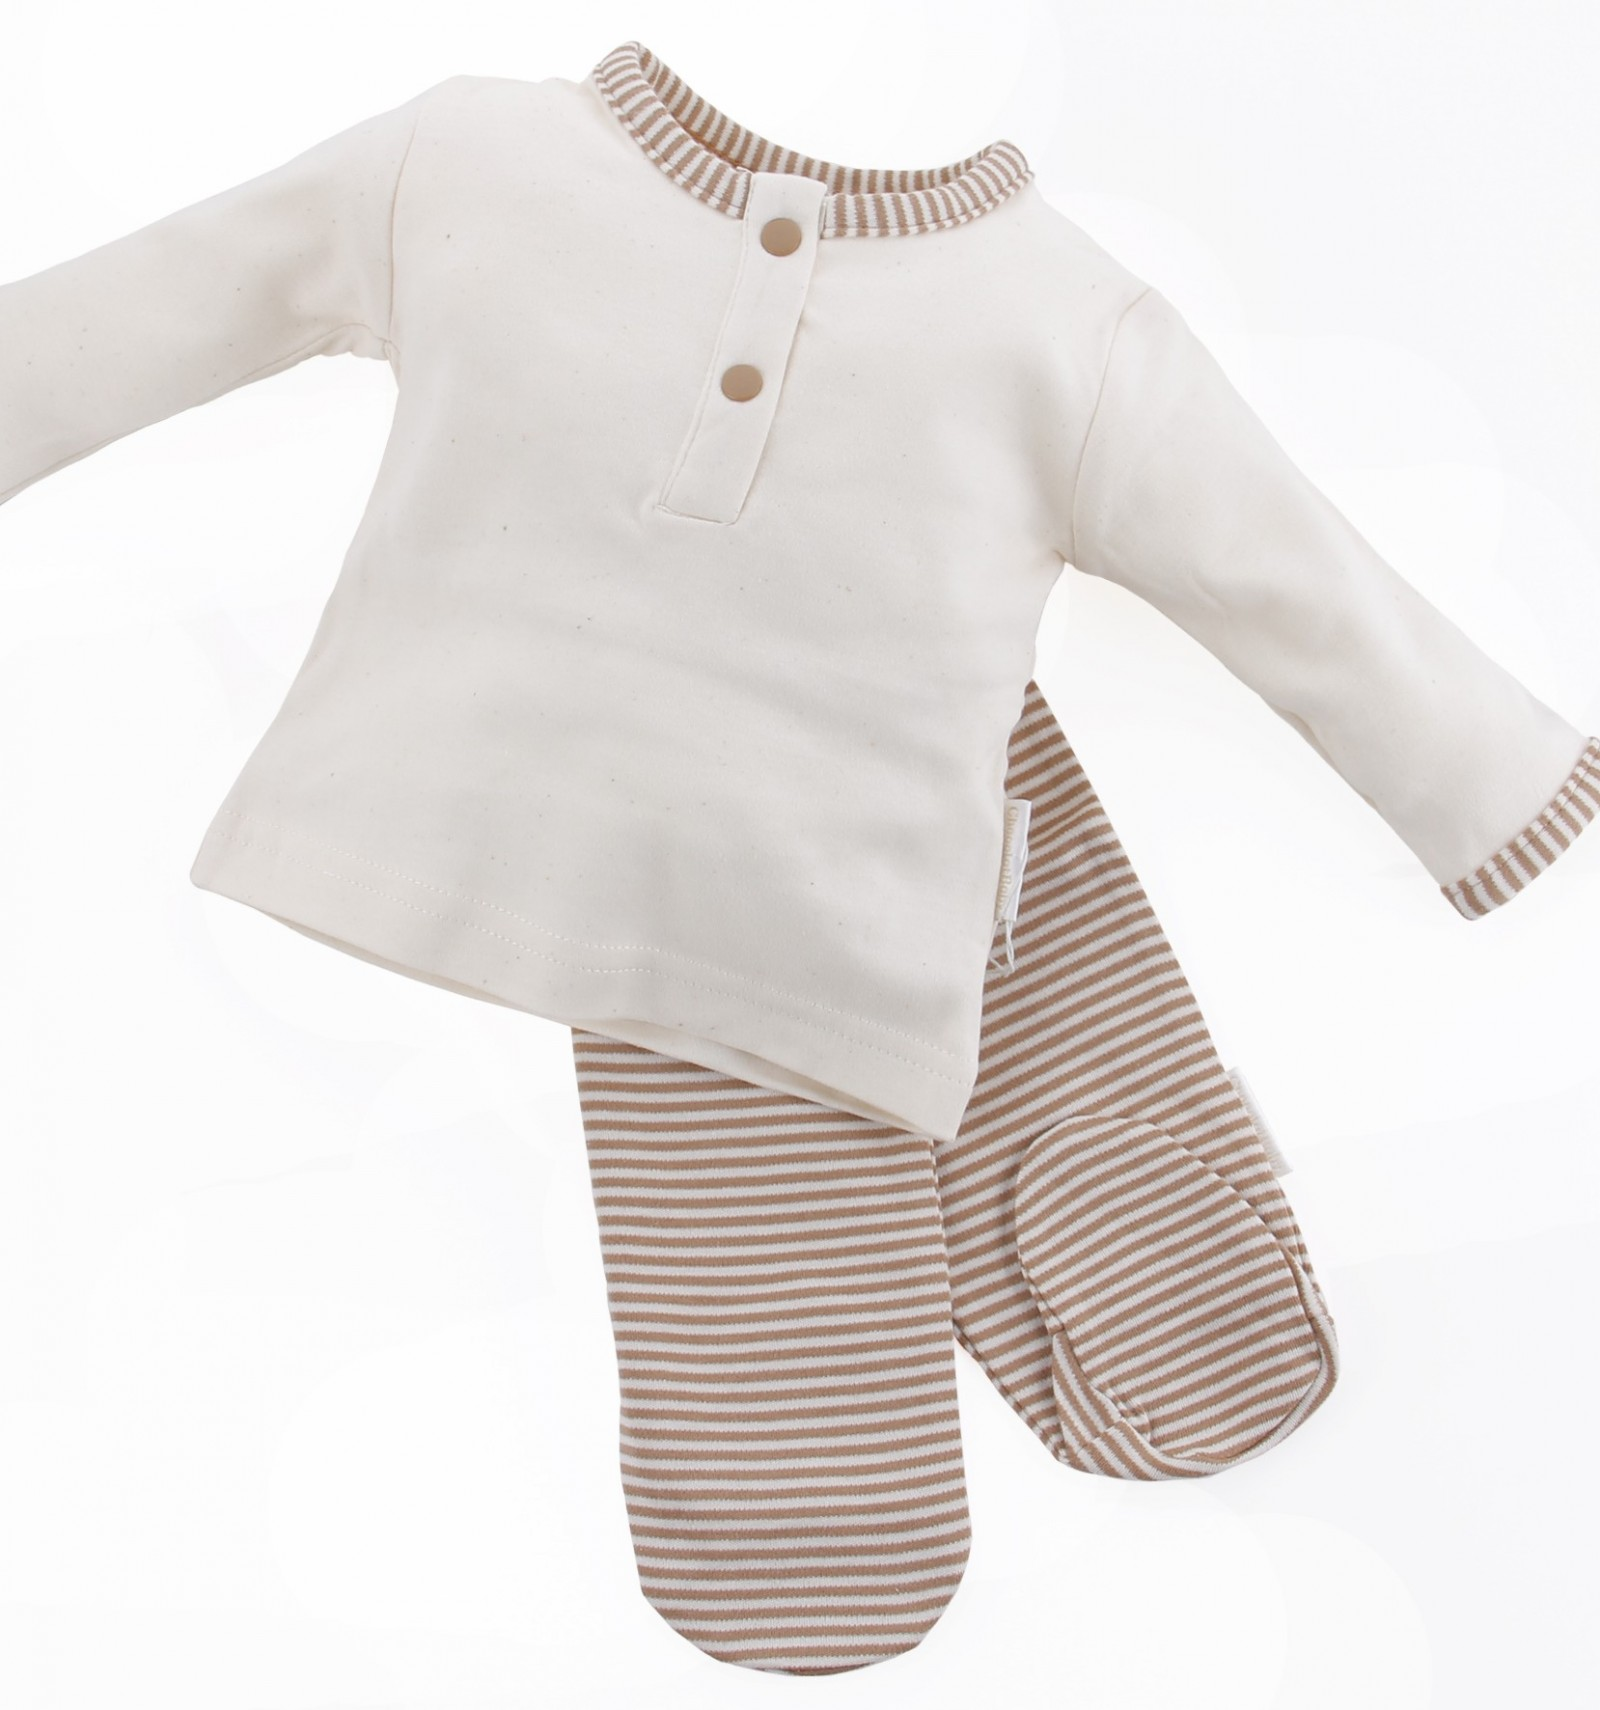 c1123b5ccb pijama para bebé algodón orgánico de dos piezas